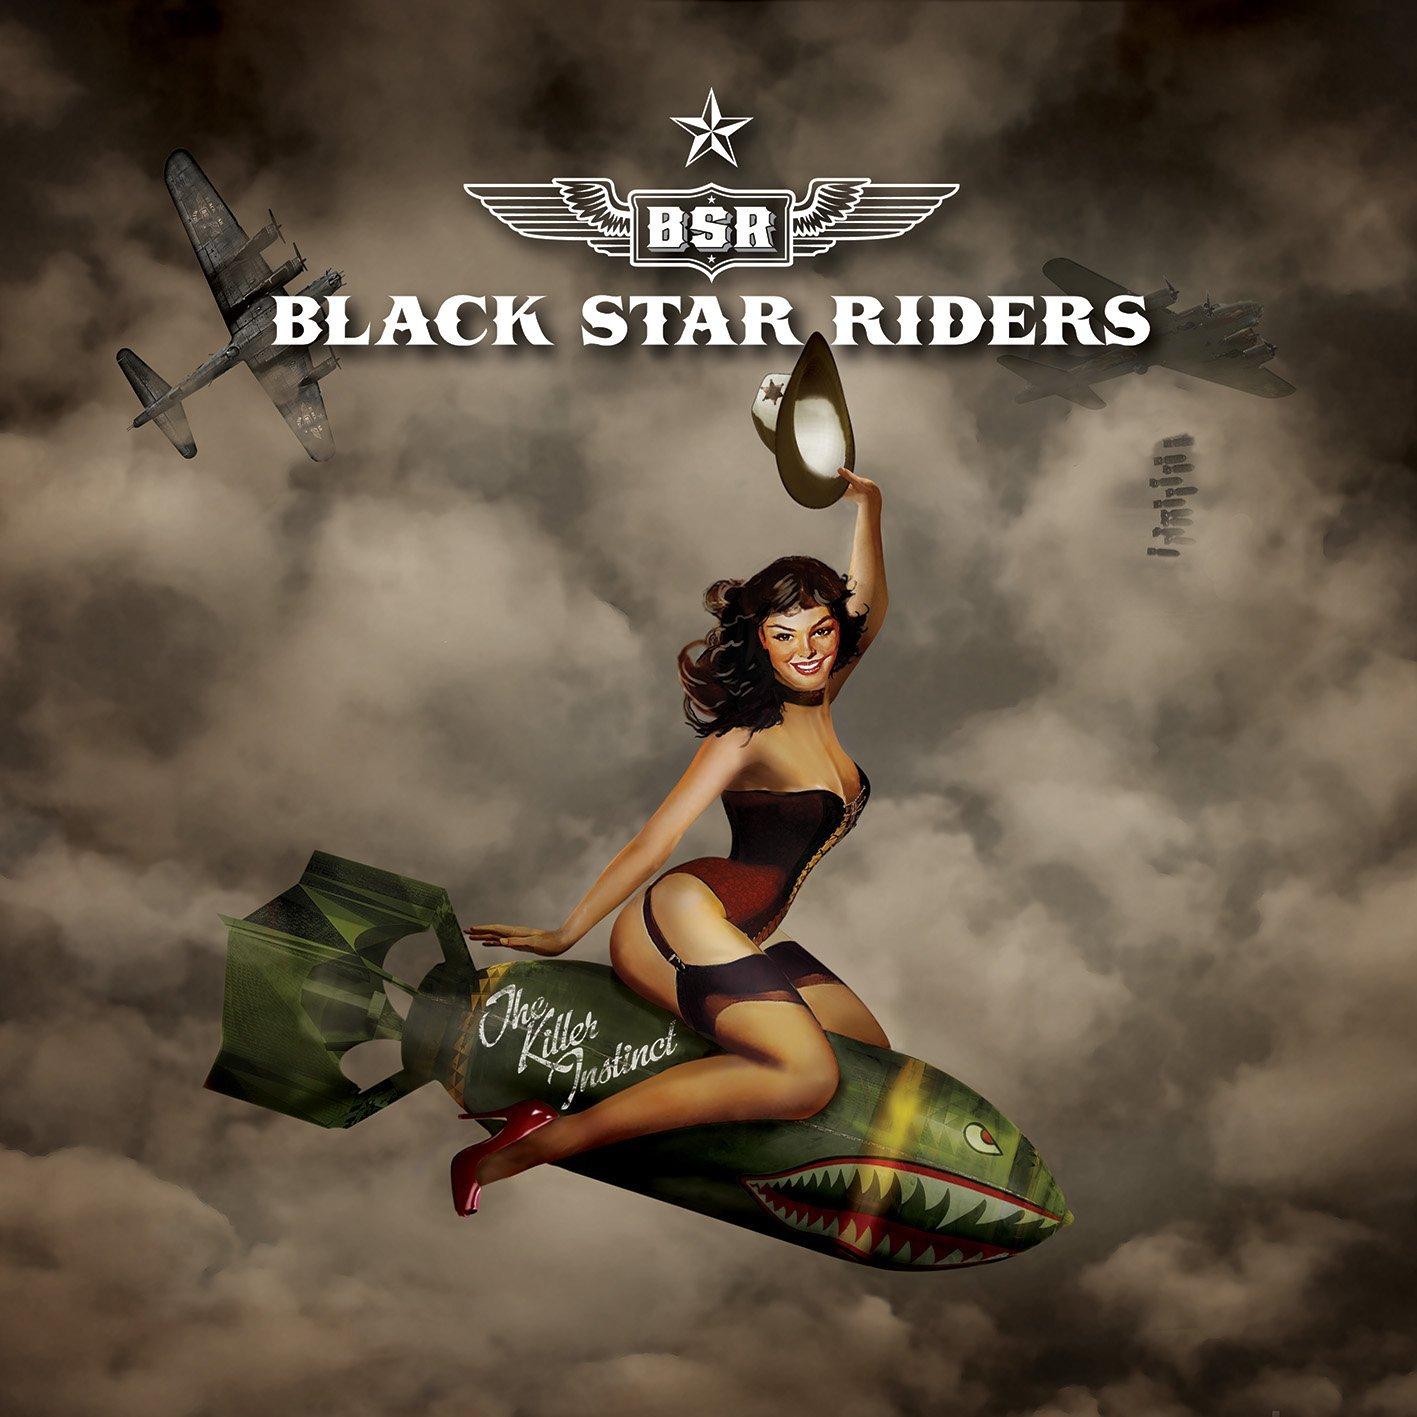 Black Star Riders: The Killer Instinct (2015) Book Cover